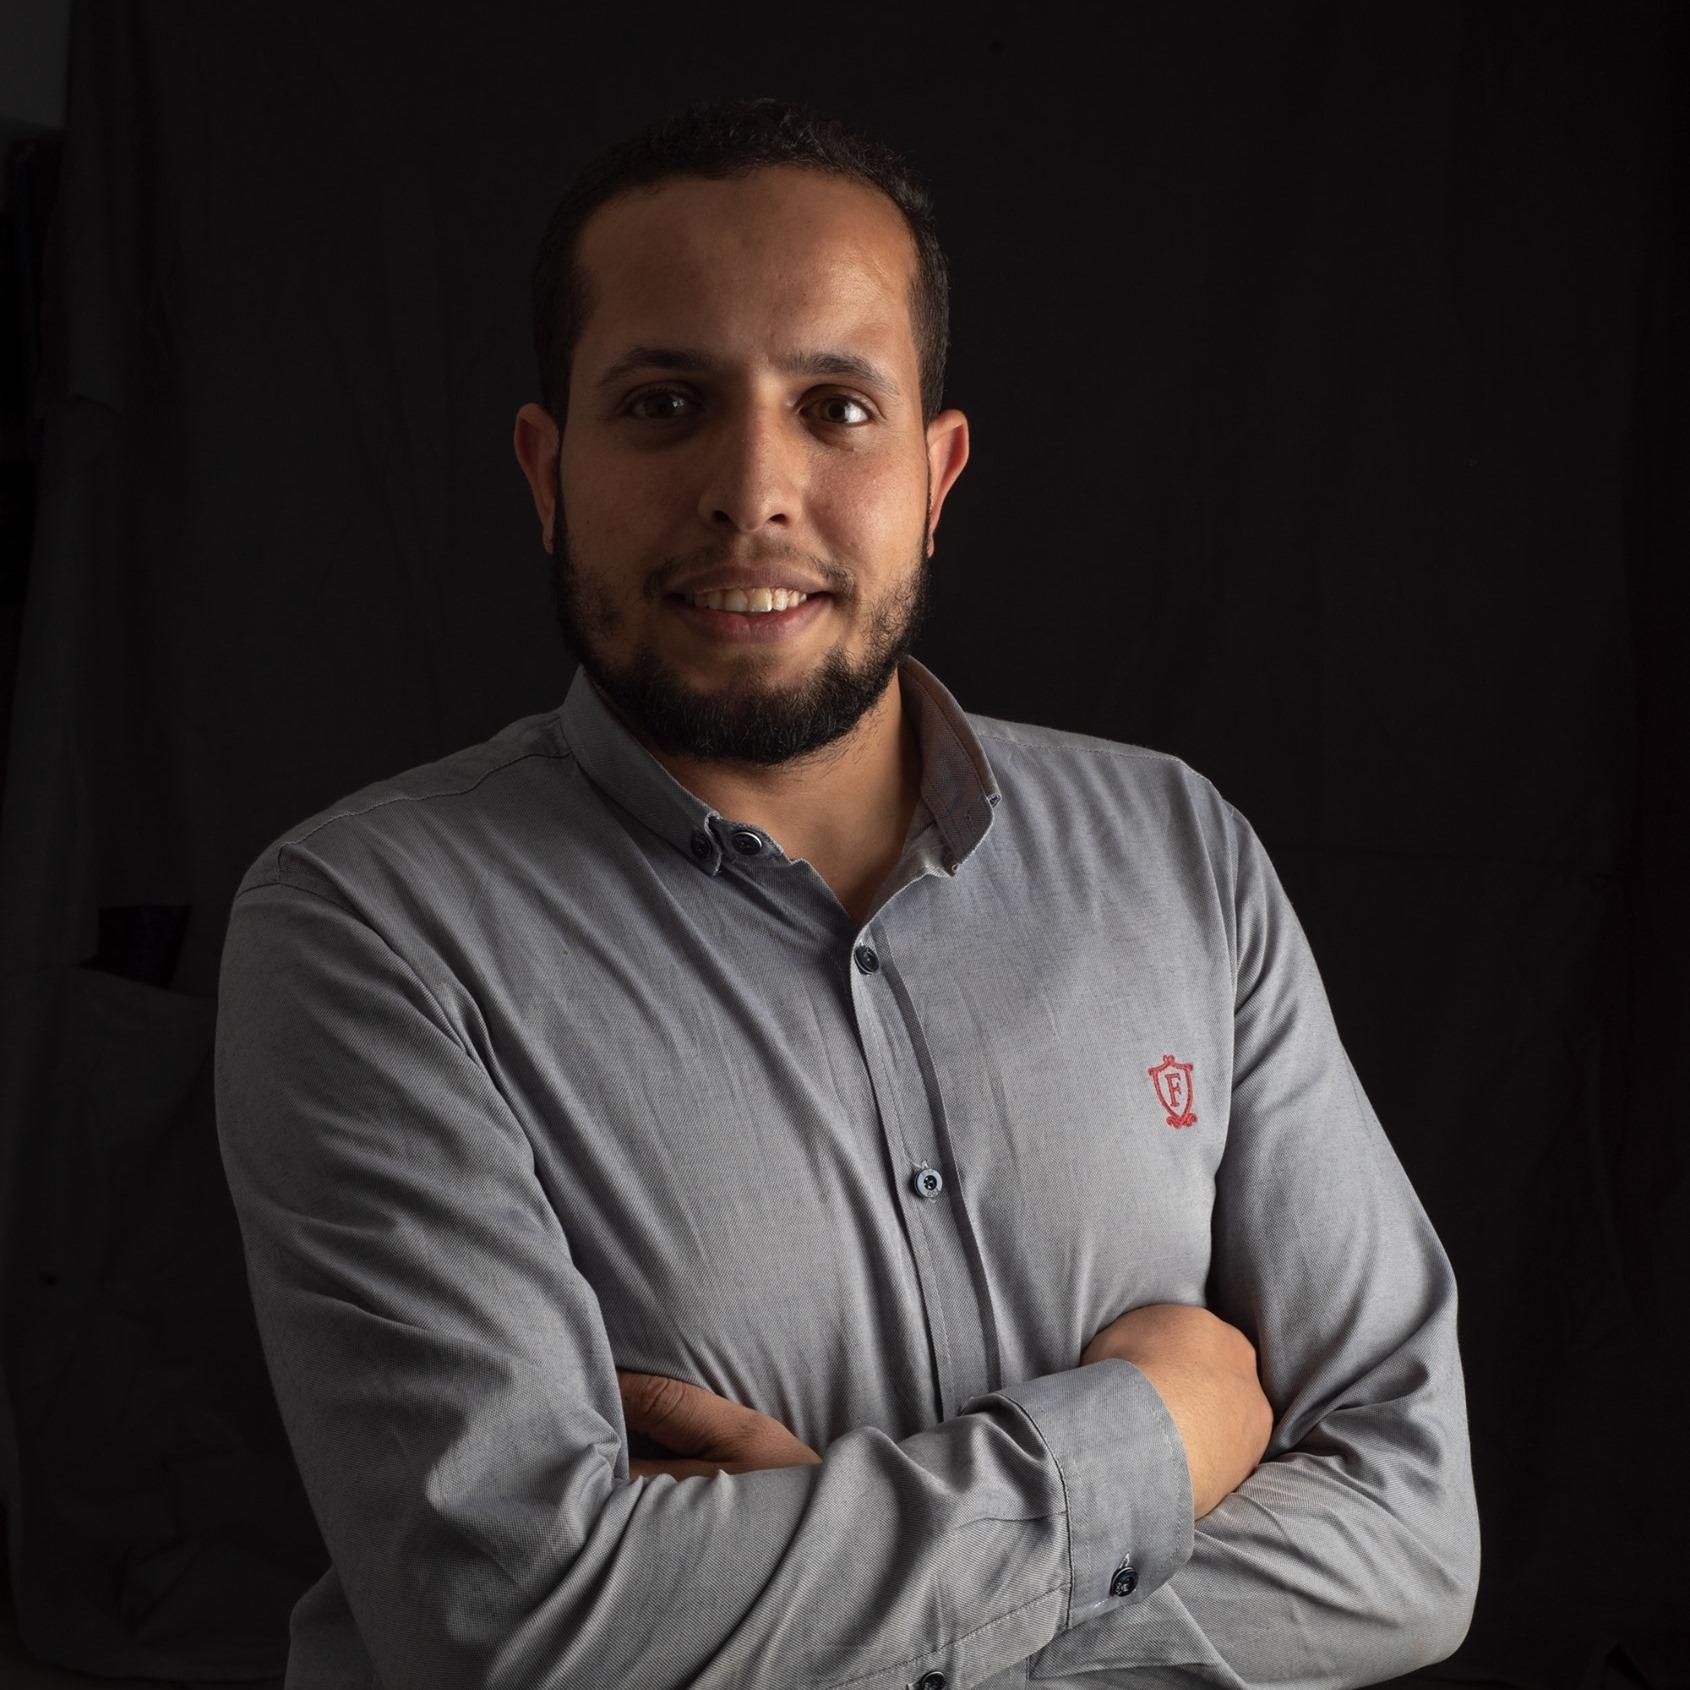 Ayman Taher